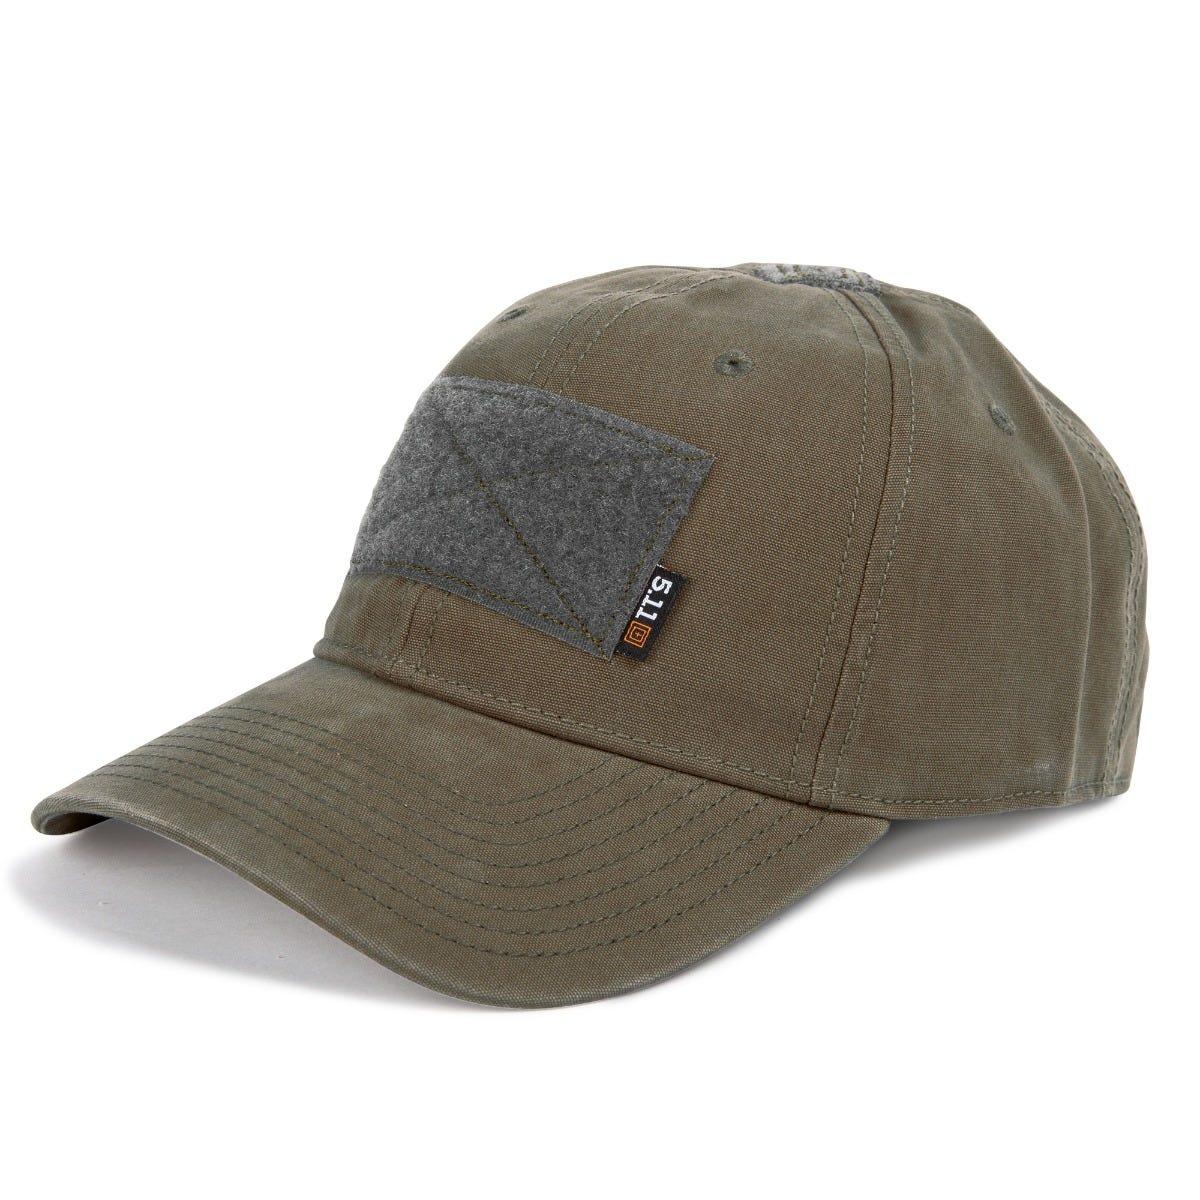 5.11 Tactical Men's Flag Bearer Cap (Ranger Green) thumbnail